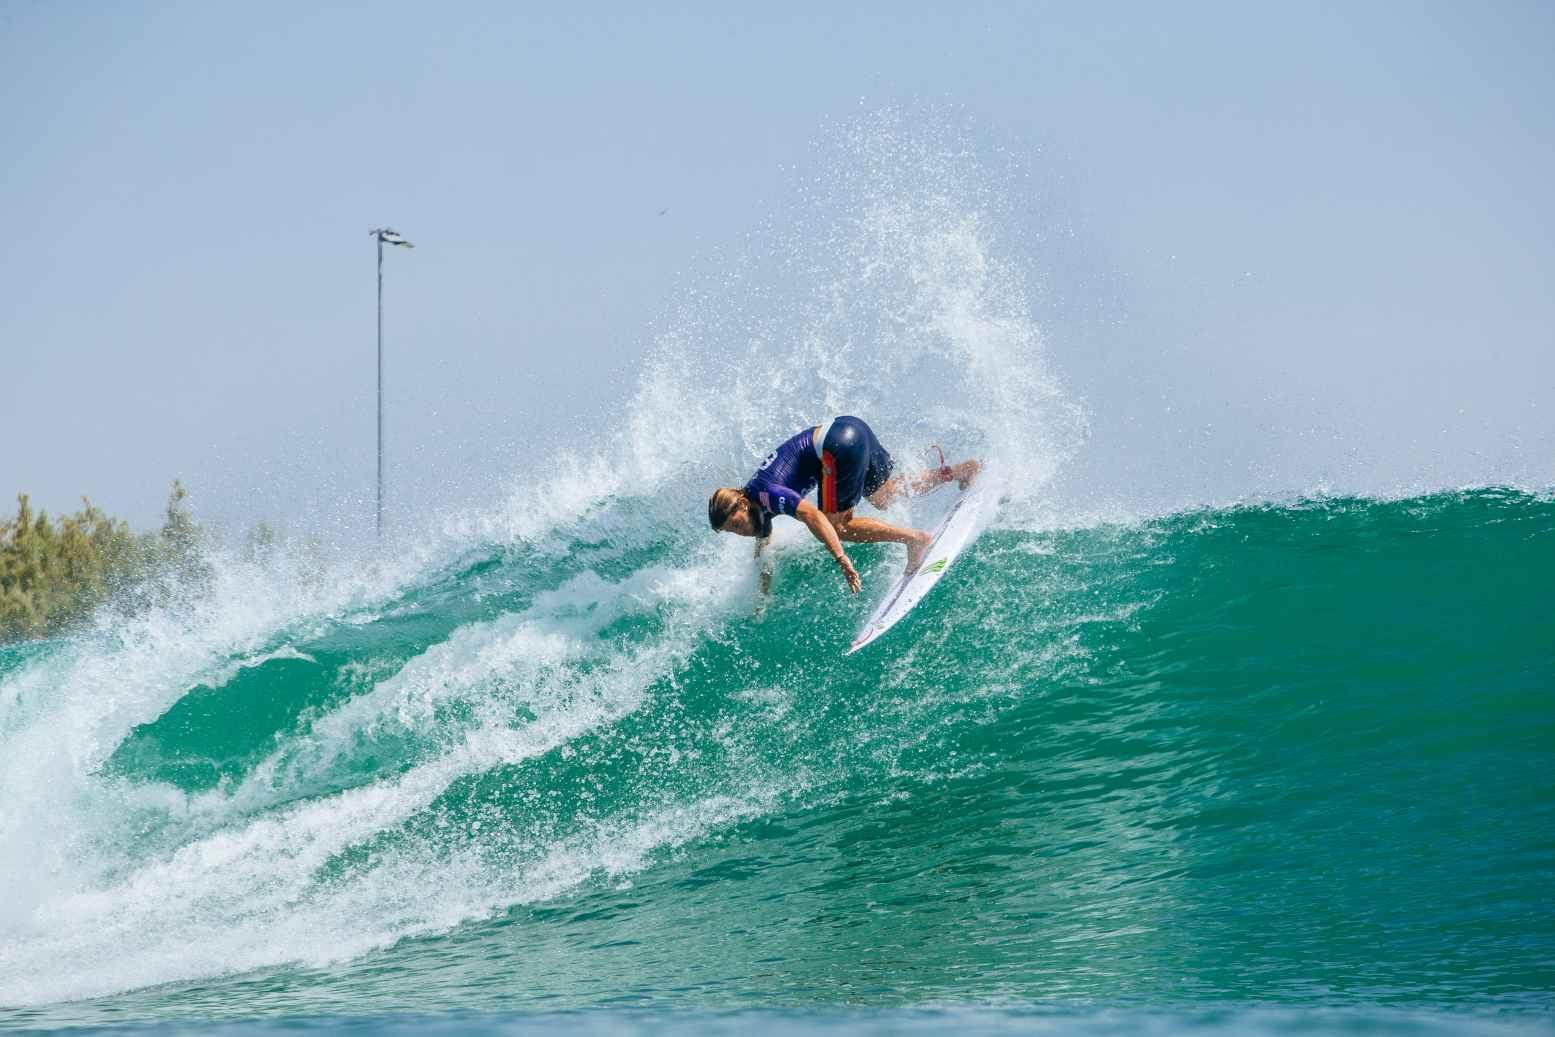 surf30 surf ranch pro 2021 wsl surf Coffin C Morris21Ranch 7146